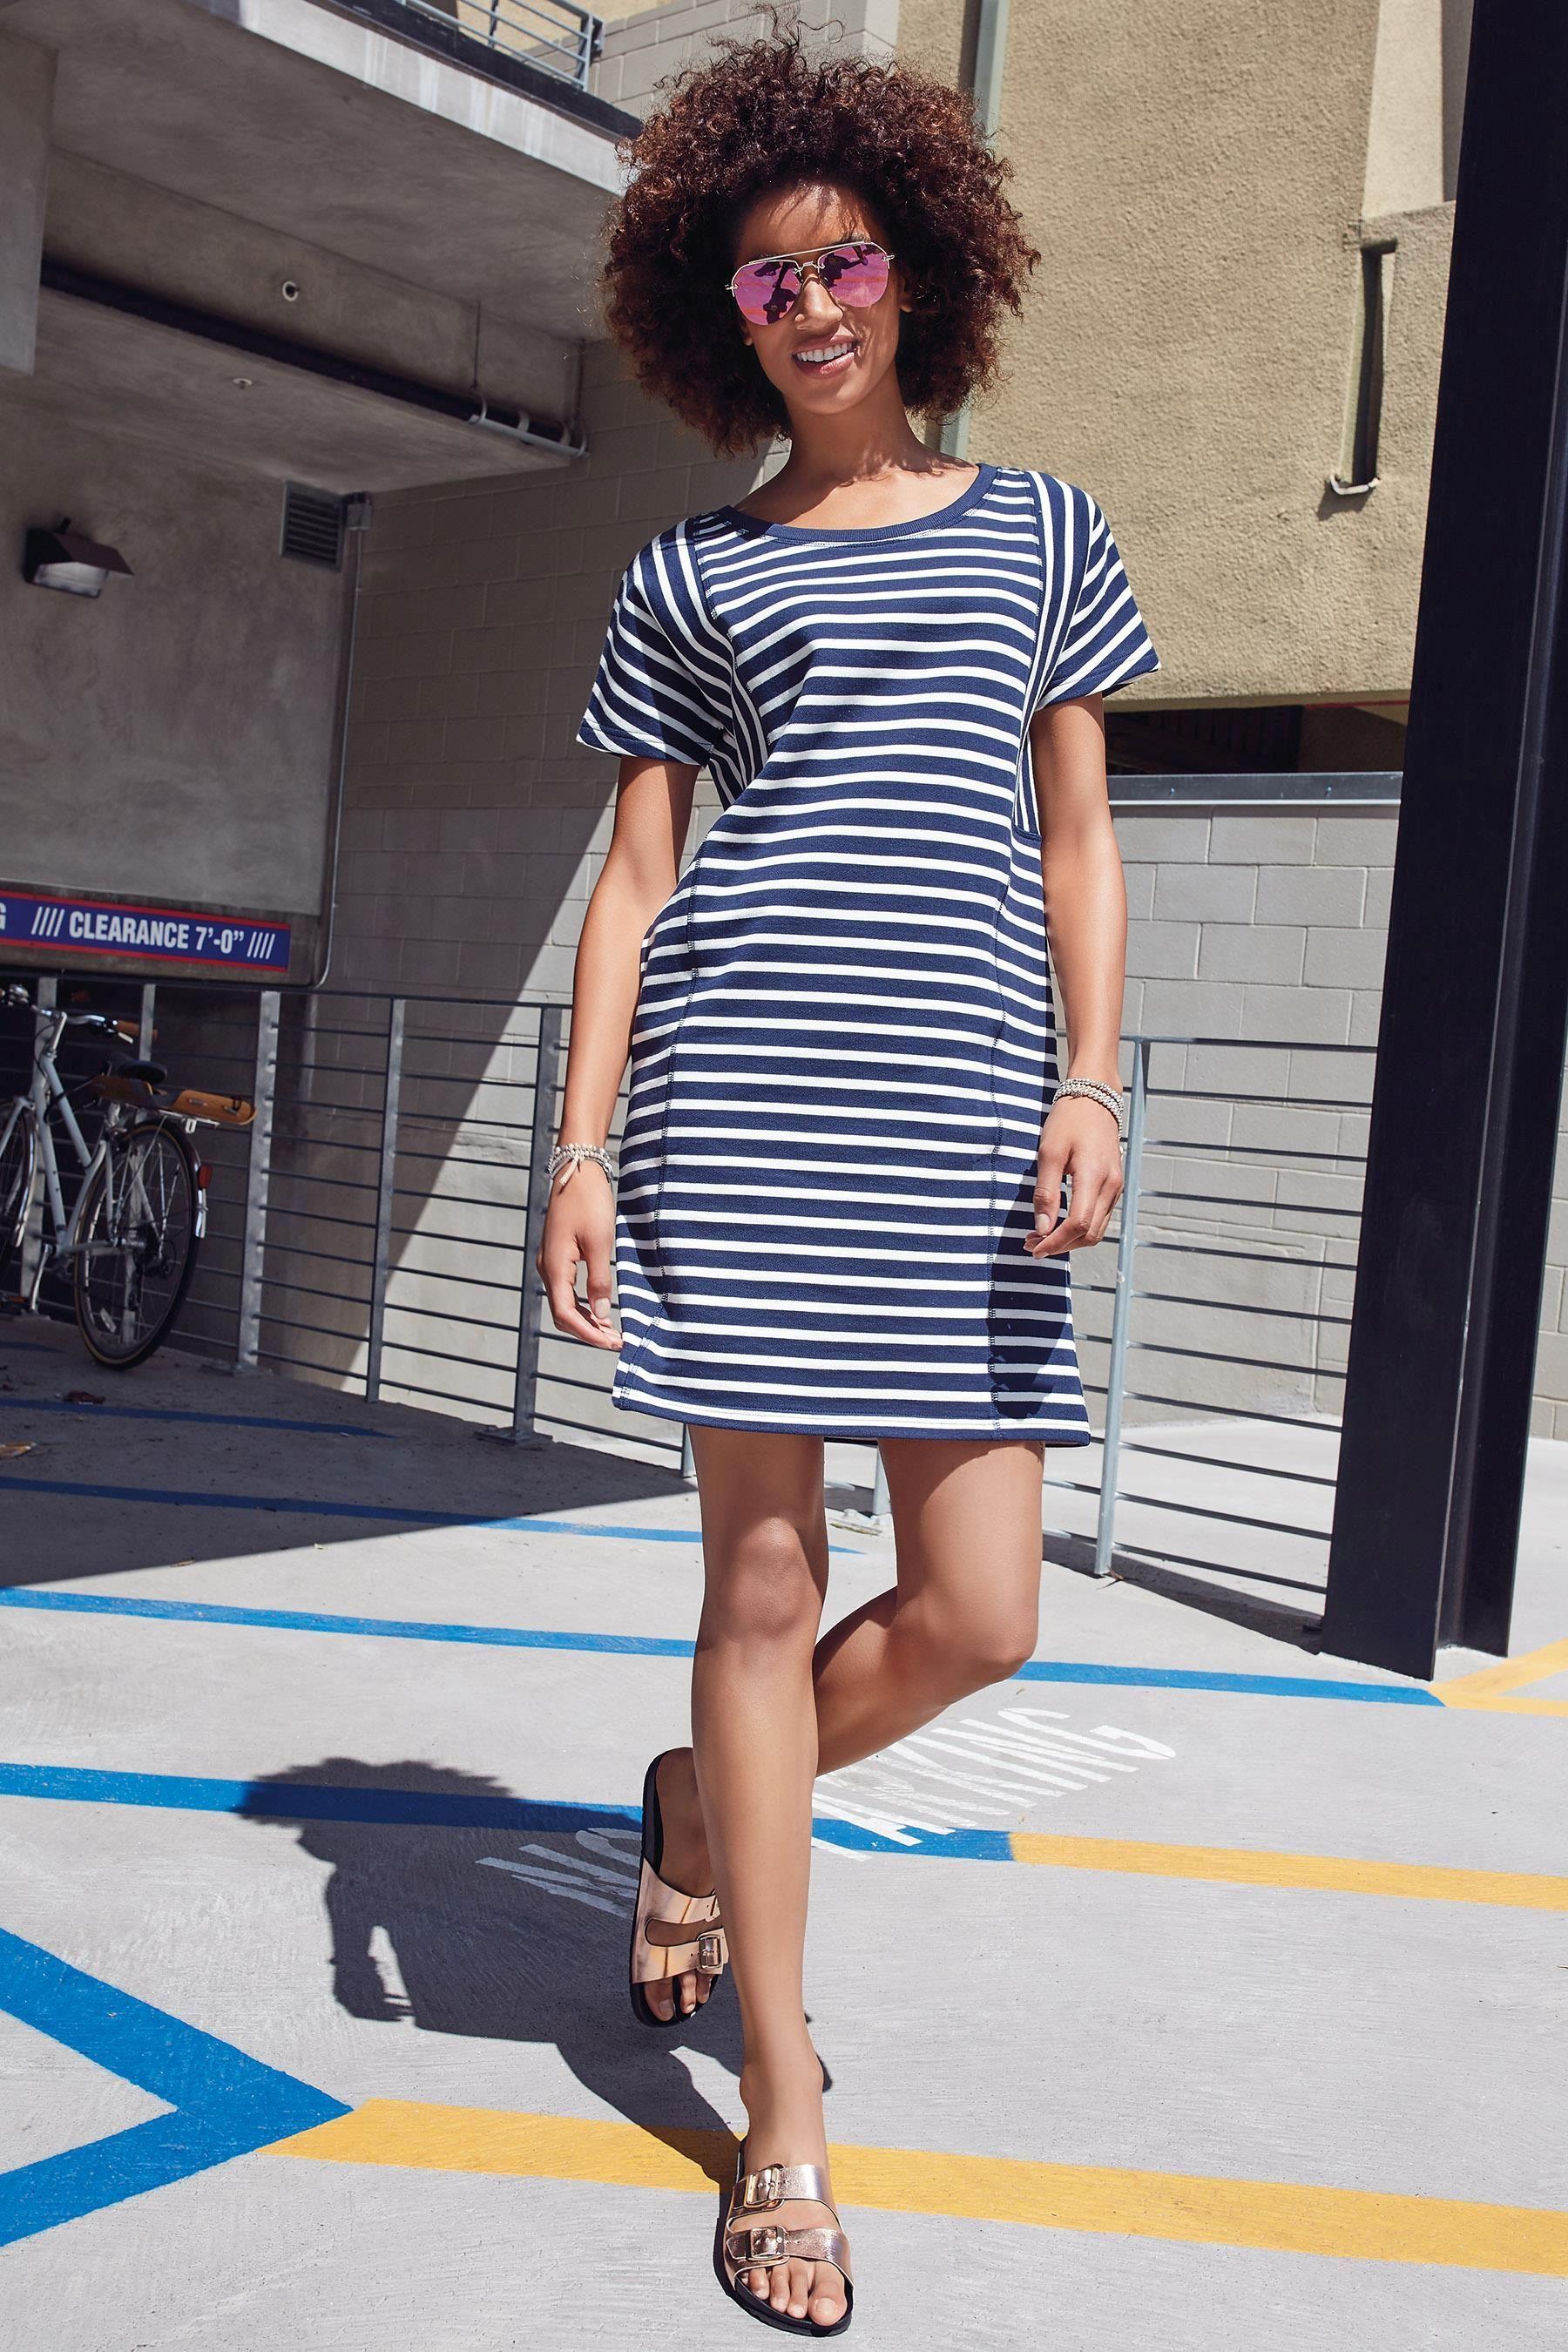 cf2c0feb526 Buy Stripe Sweat Dress from the Next UK online shop